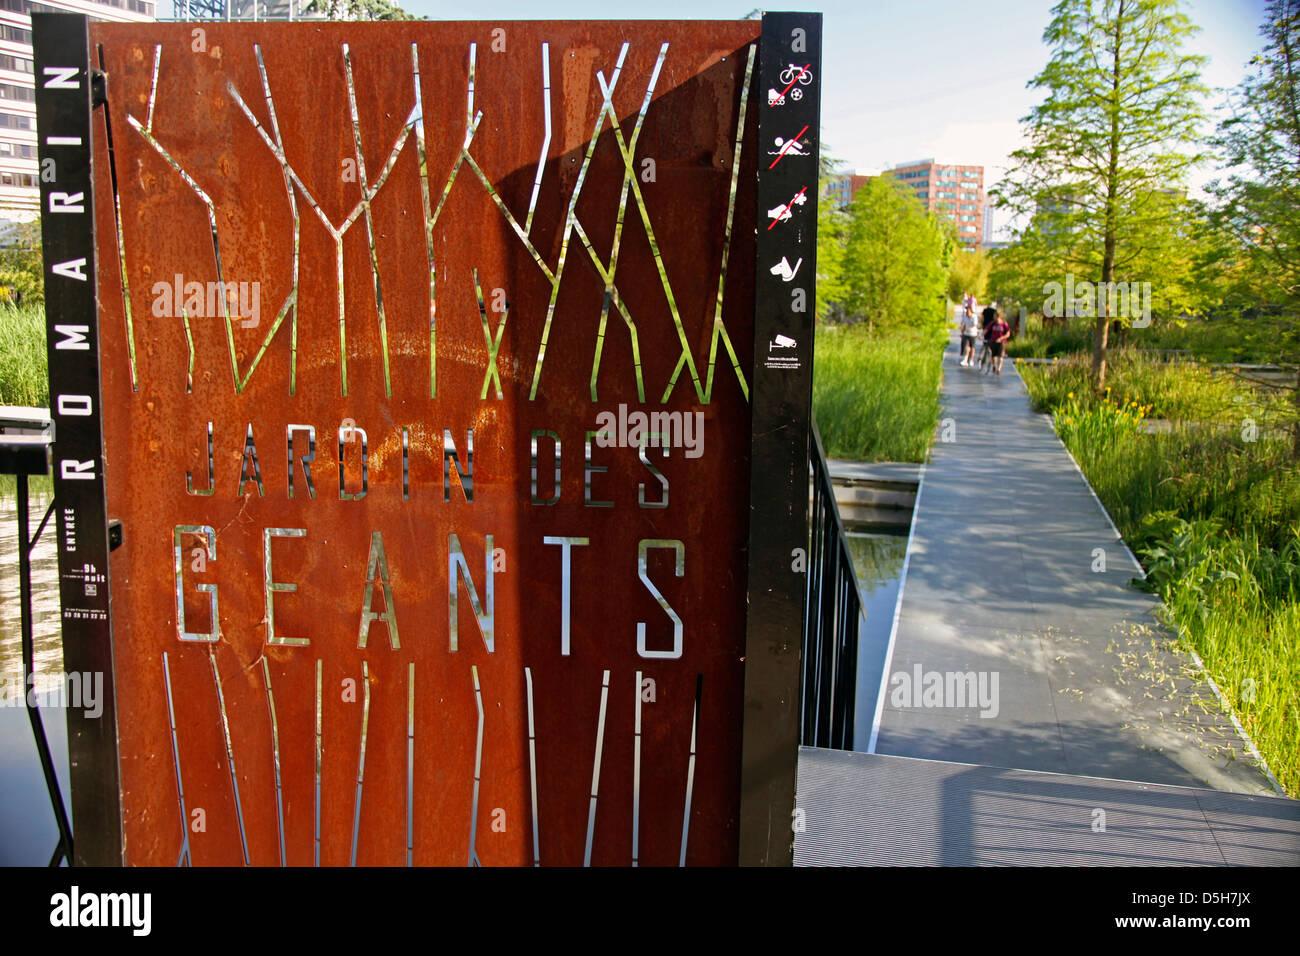 Europa, Francia, Lille. El jardín de gigantes, Lille. Imagen De Stock